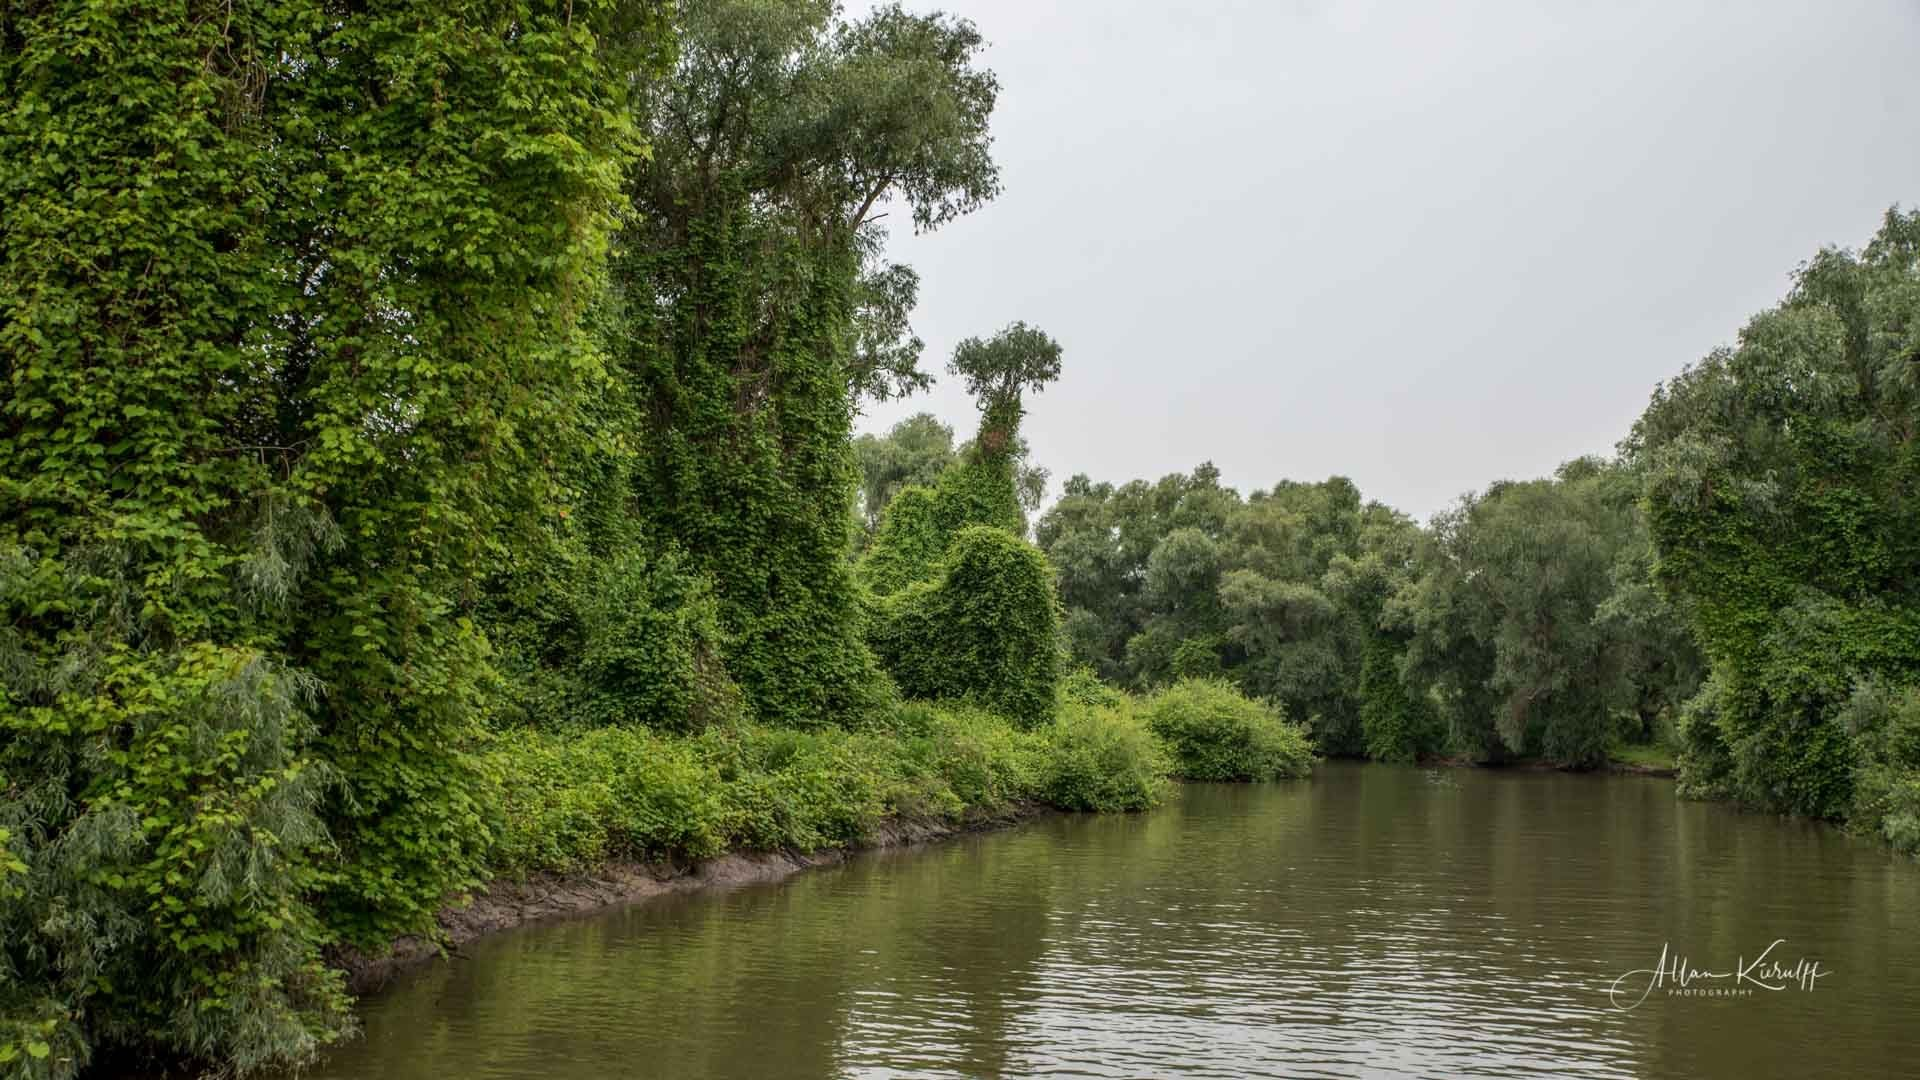 Donau Deltaet 47